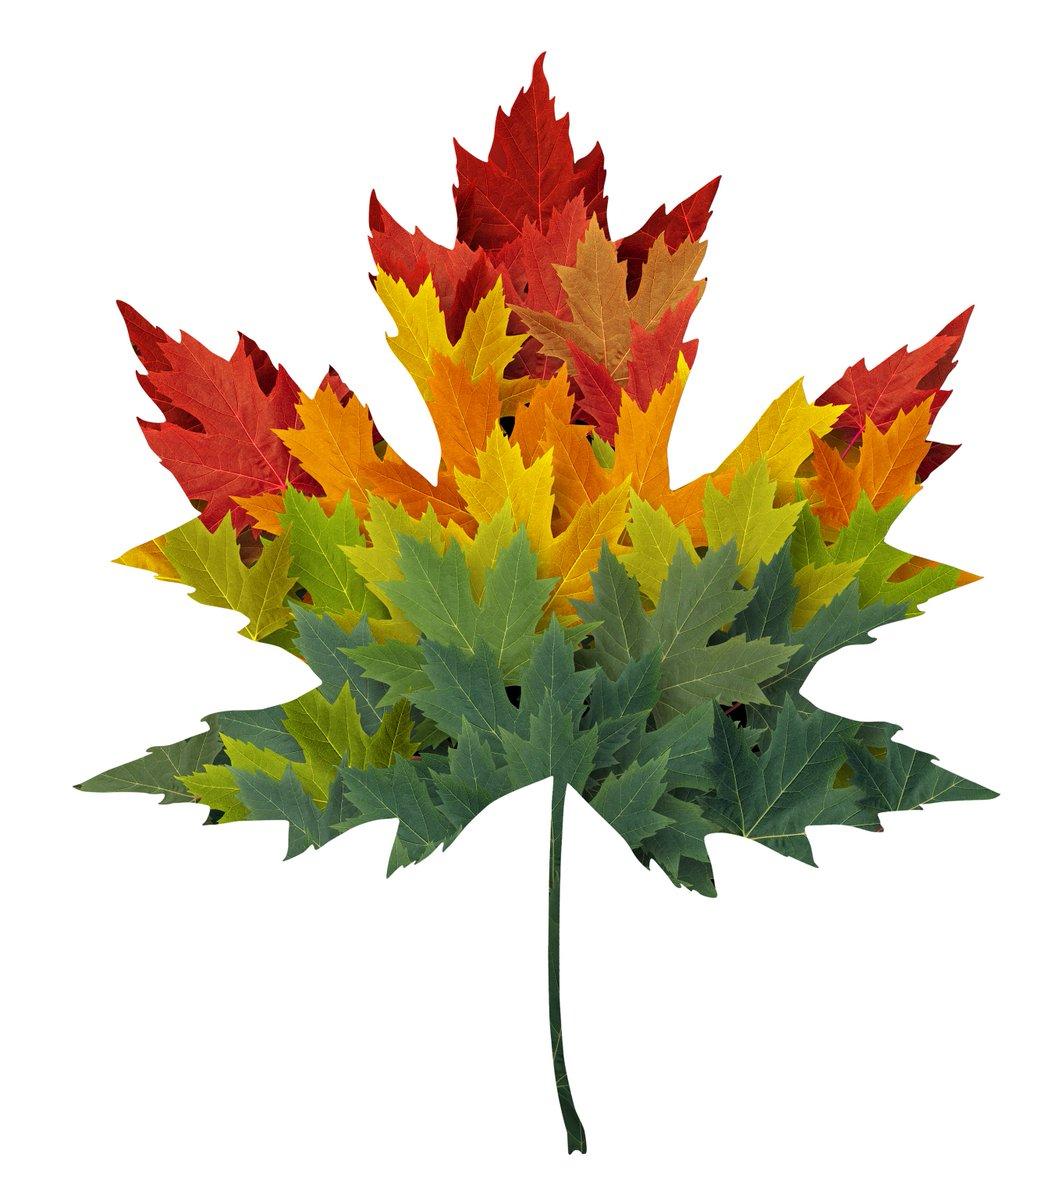 Maple Leaf Wallpaper For Fall Season Statistics Canada Statcan Eng Twitter